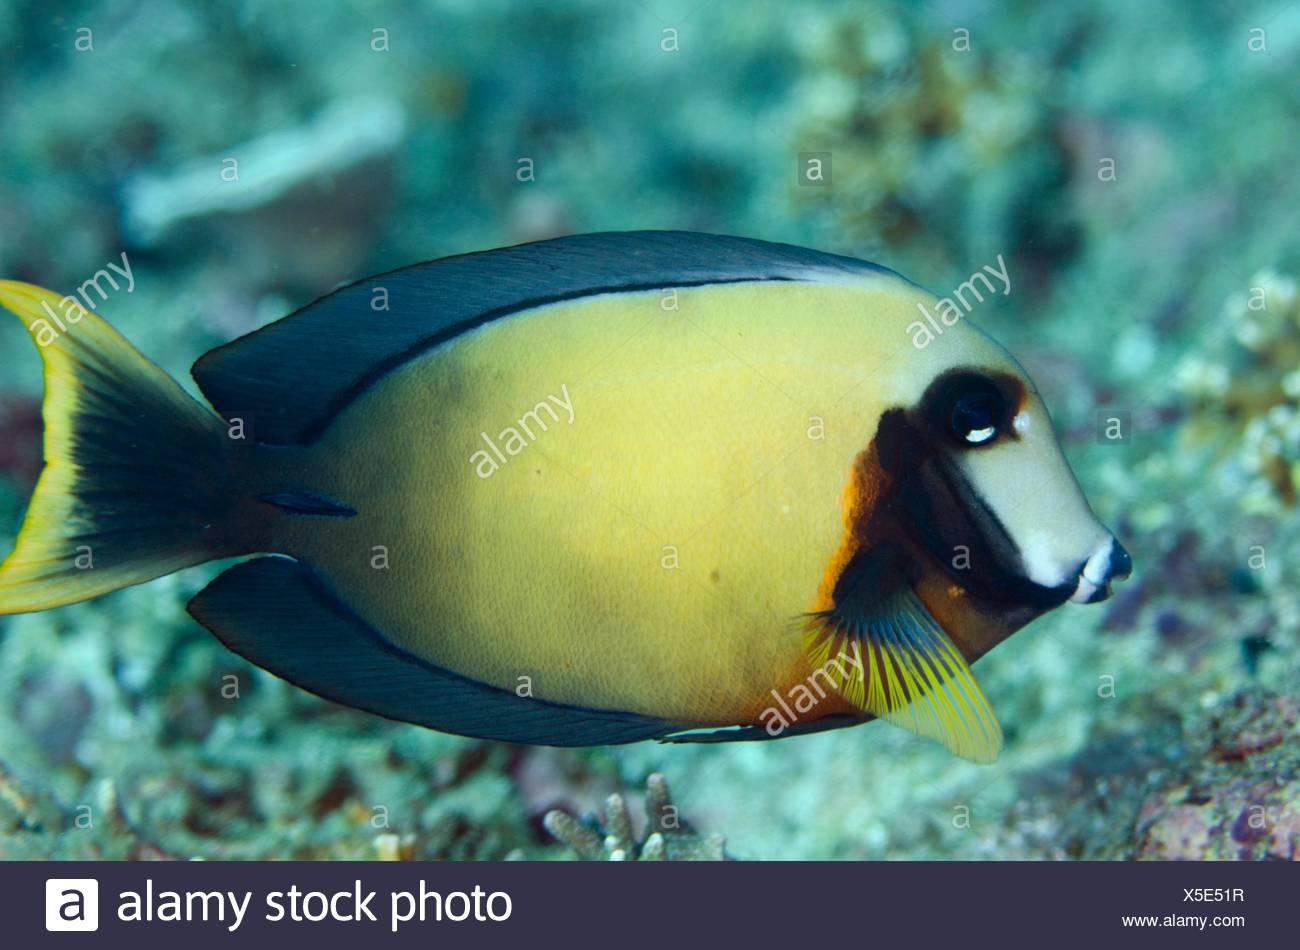 Mimic Surgeonfish (Acanthurus pyroferus), Crystal Lagoon dive site, Candidasa, Bali, Indonesia. - Stock Image